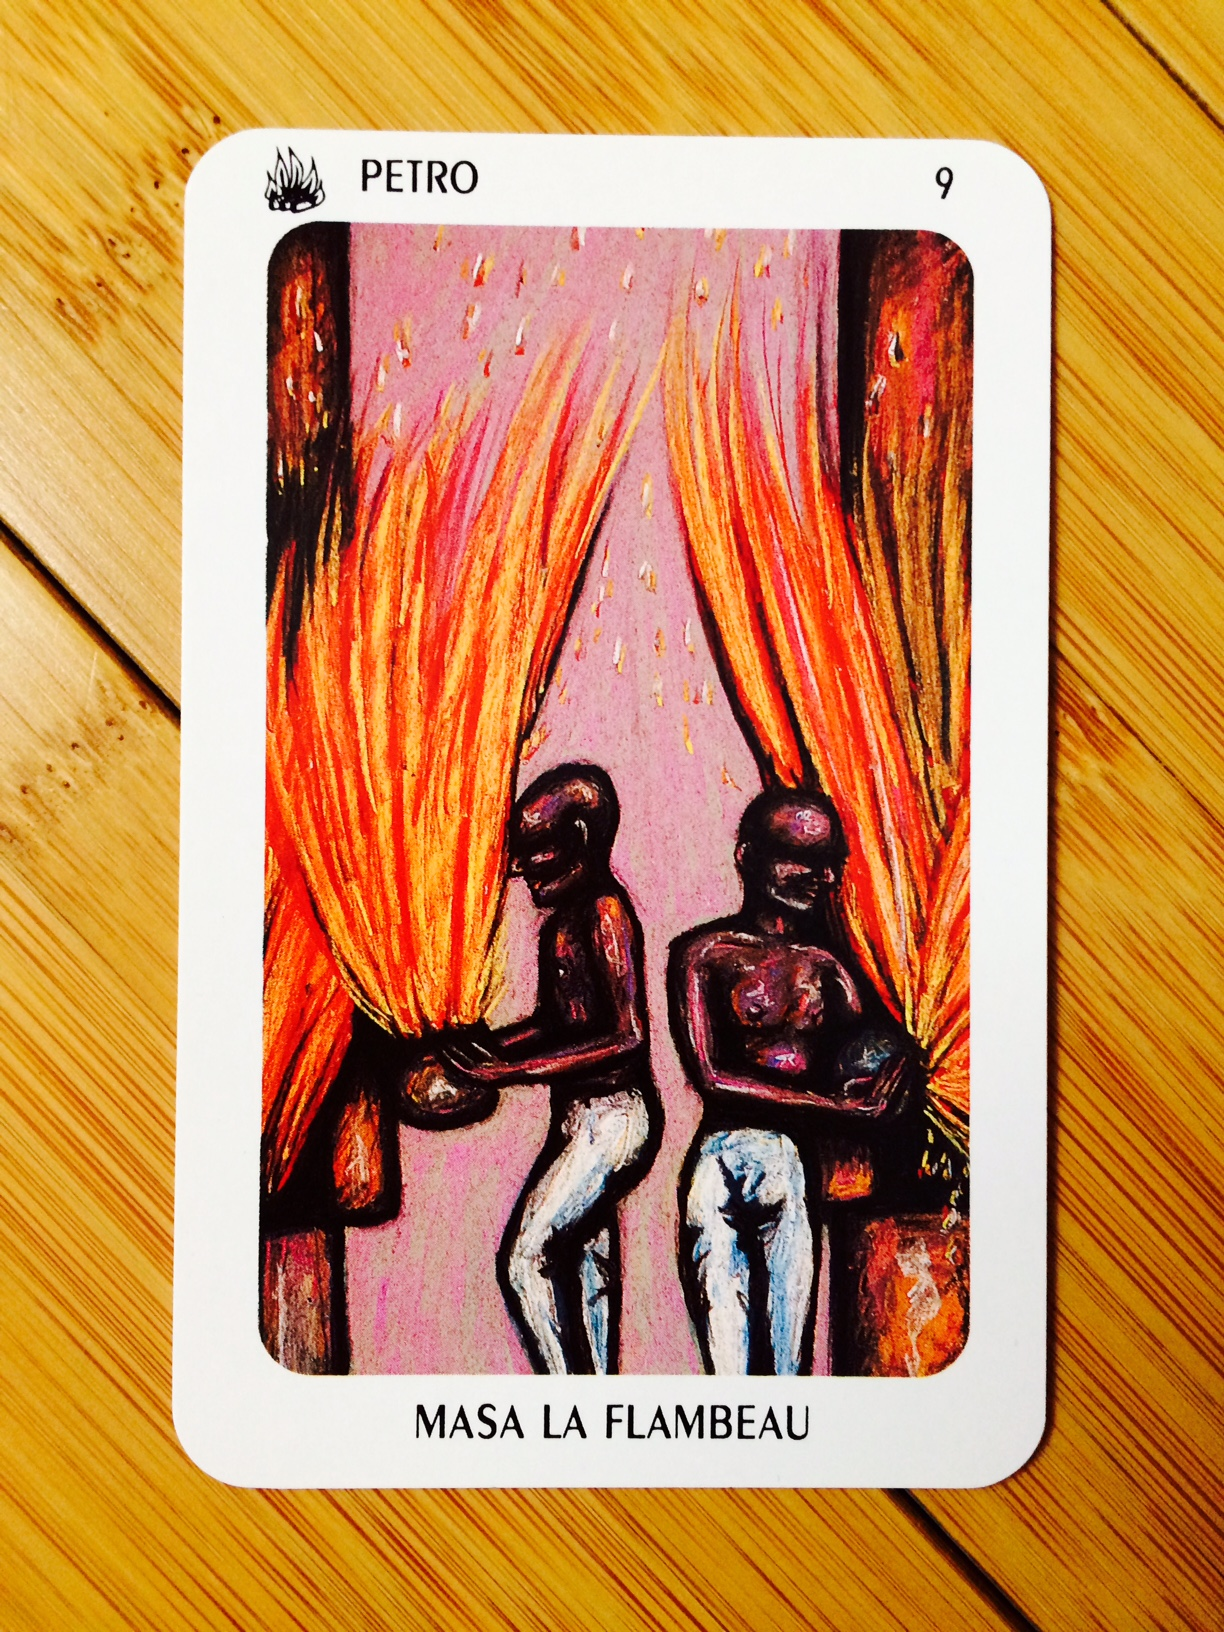 Petro - Masa La Flambeau card from  The New Orleans Voodoo Tarot